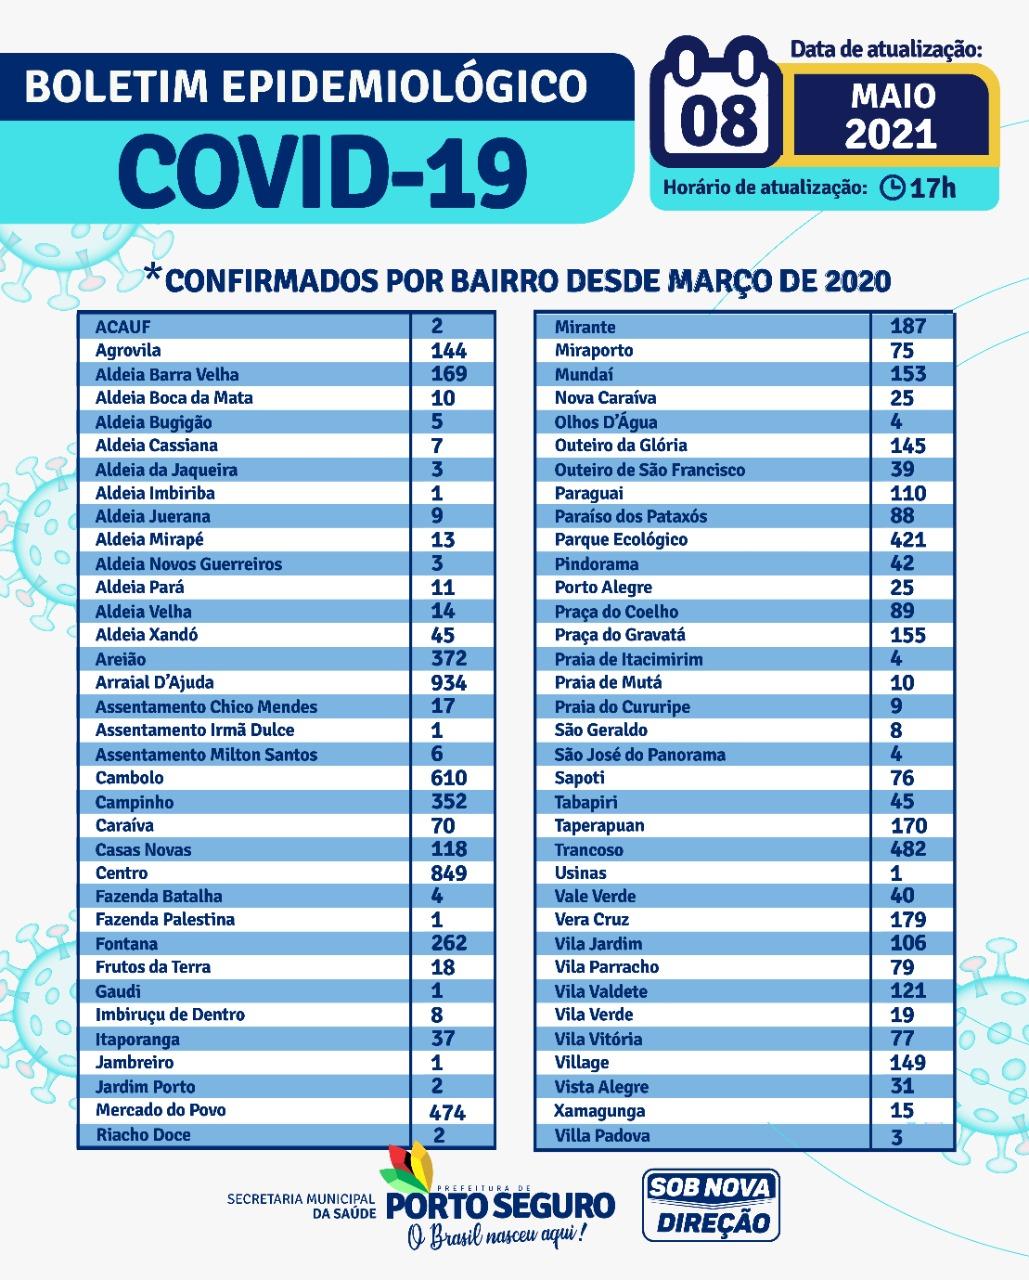 Porto Seguro: Boletim Epidemiológico Covid-19 (08/05/2021) 24